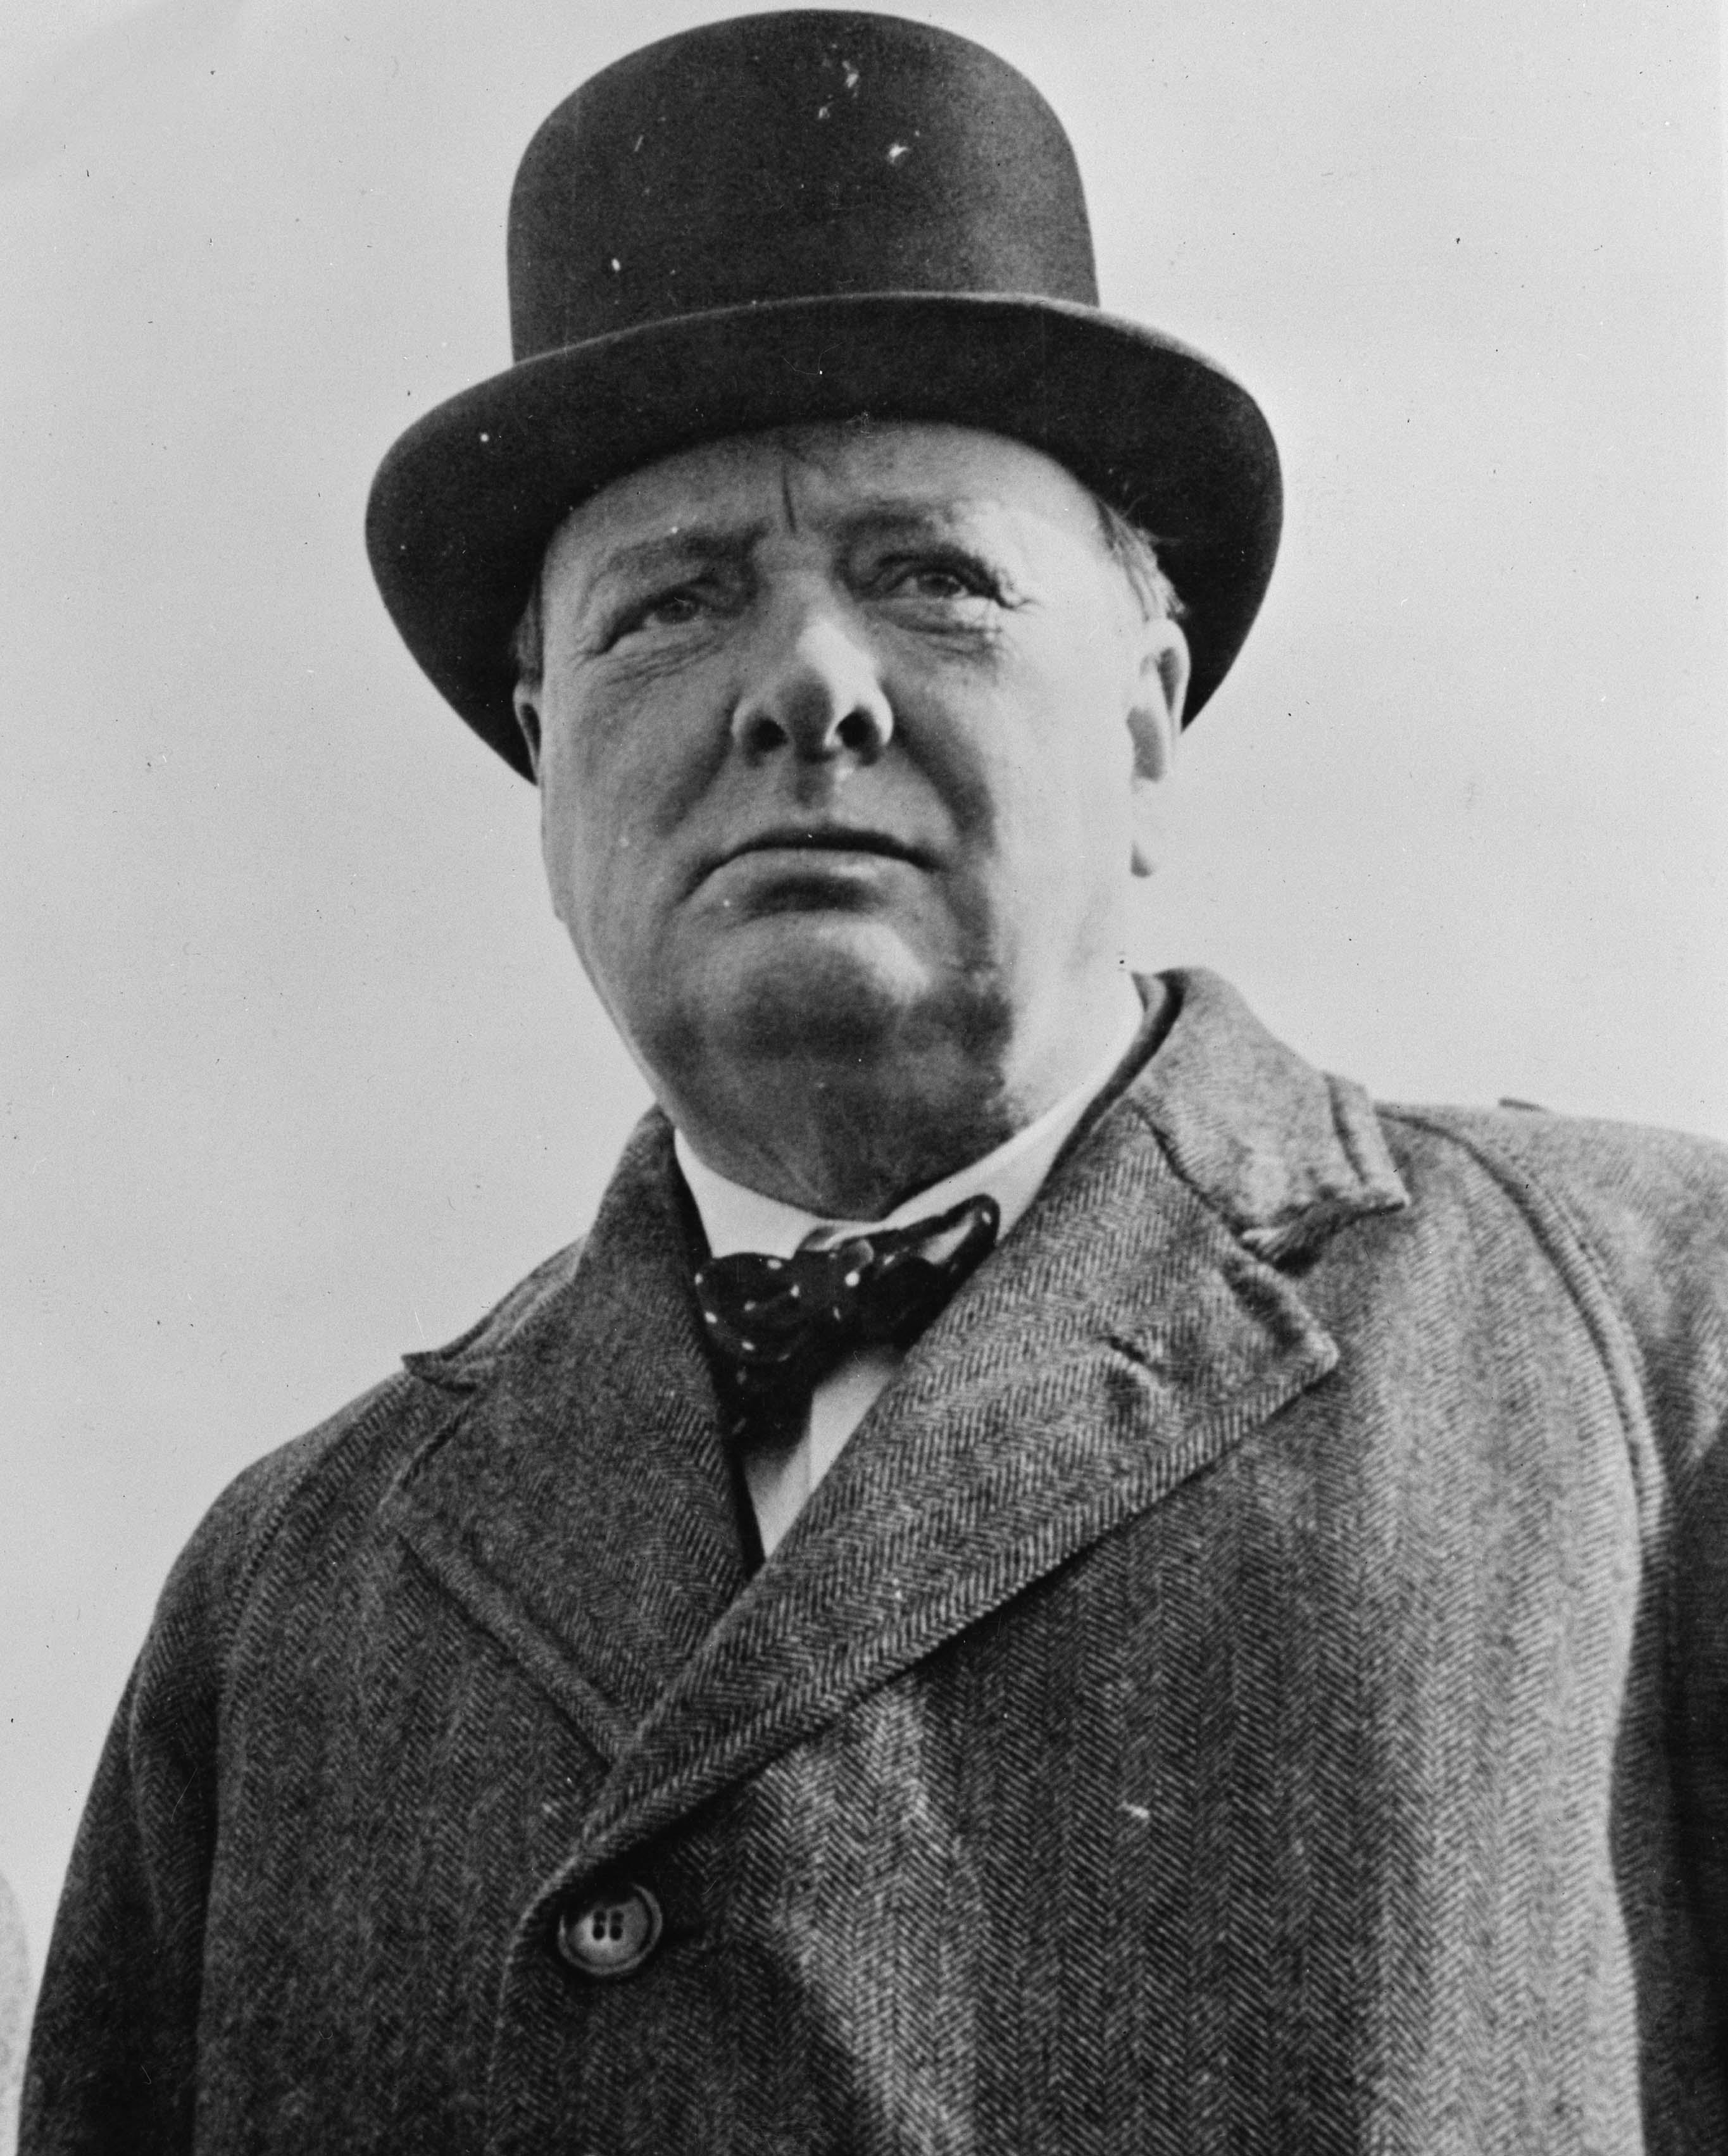 Ww2 Quotes: Winston Churchill Ww2 Quotes. QuotesGram